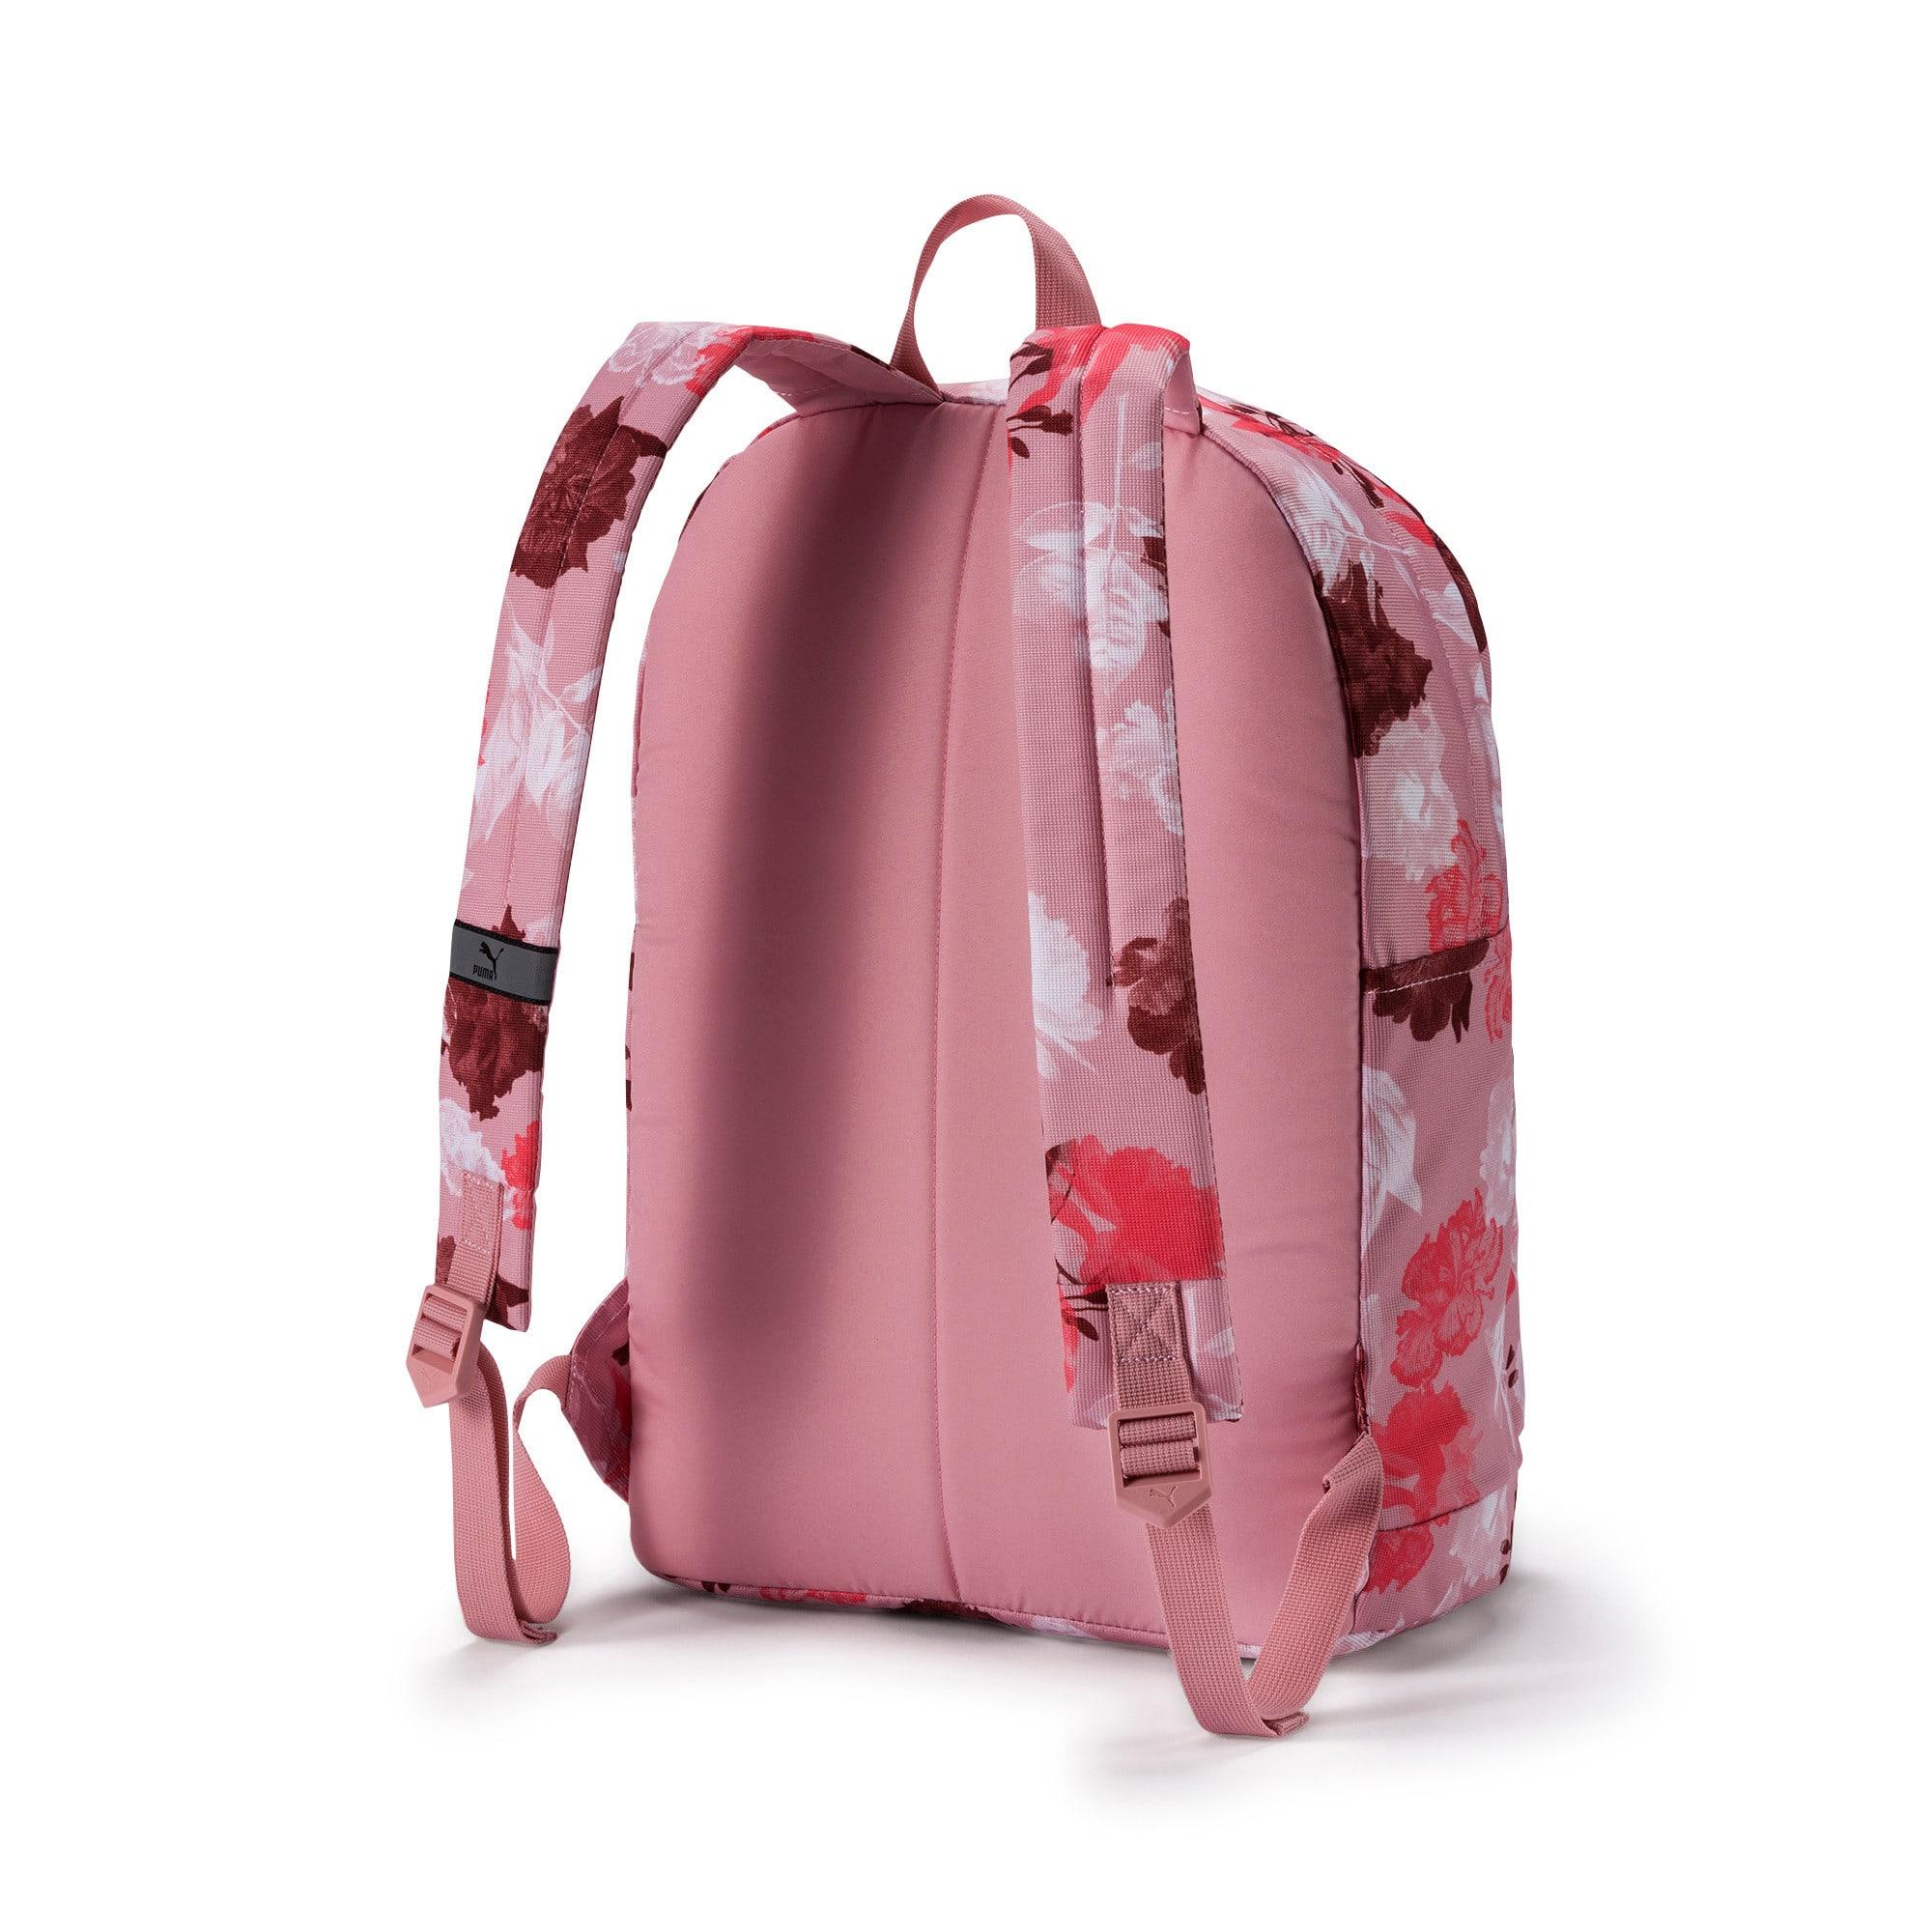 Thumbnail 3 of Originals Backpack, Bridal Rose-AOP, medium